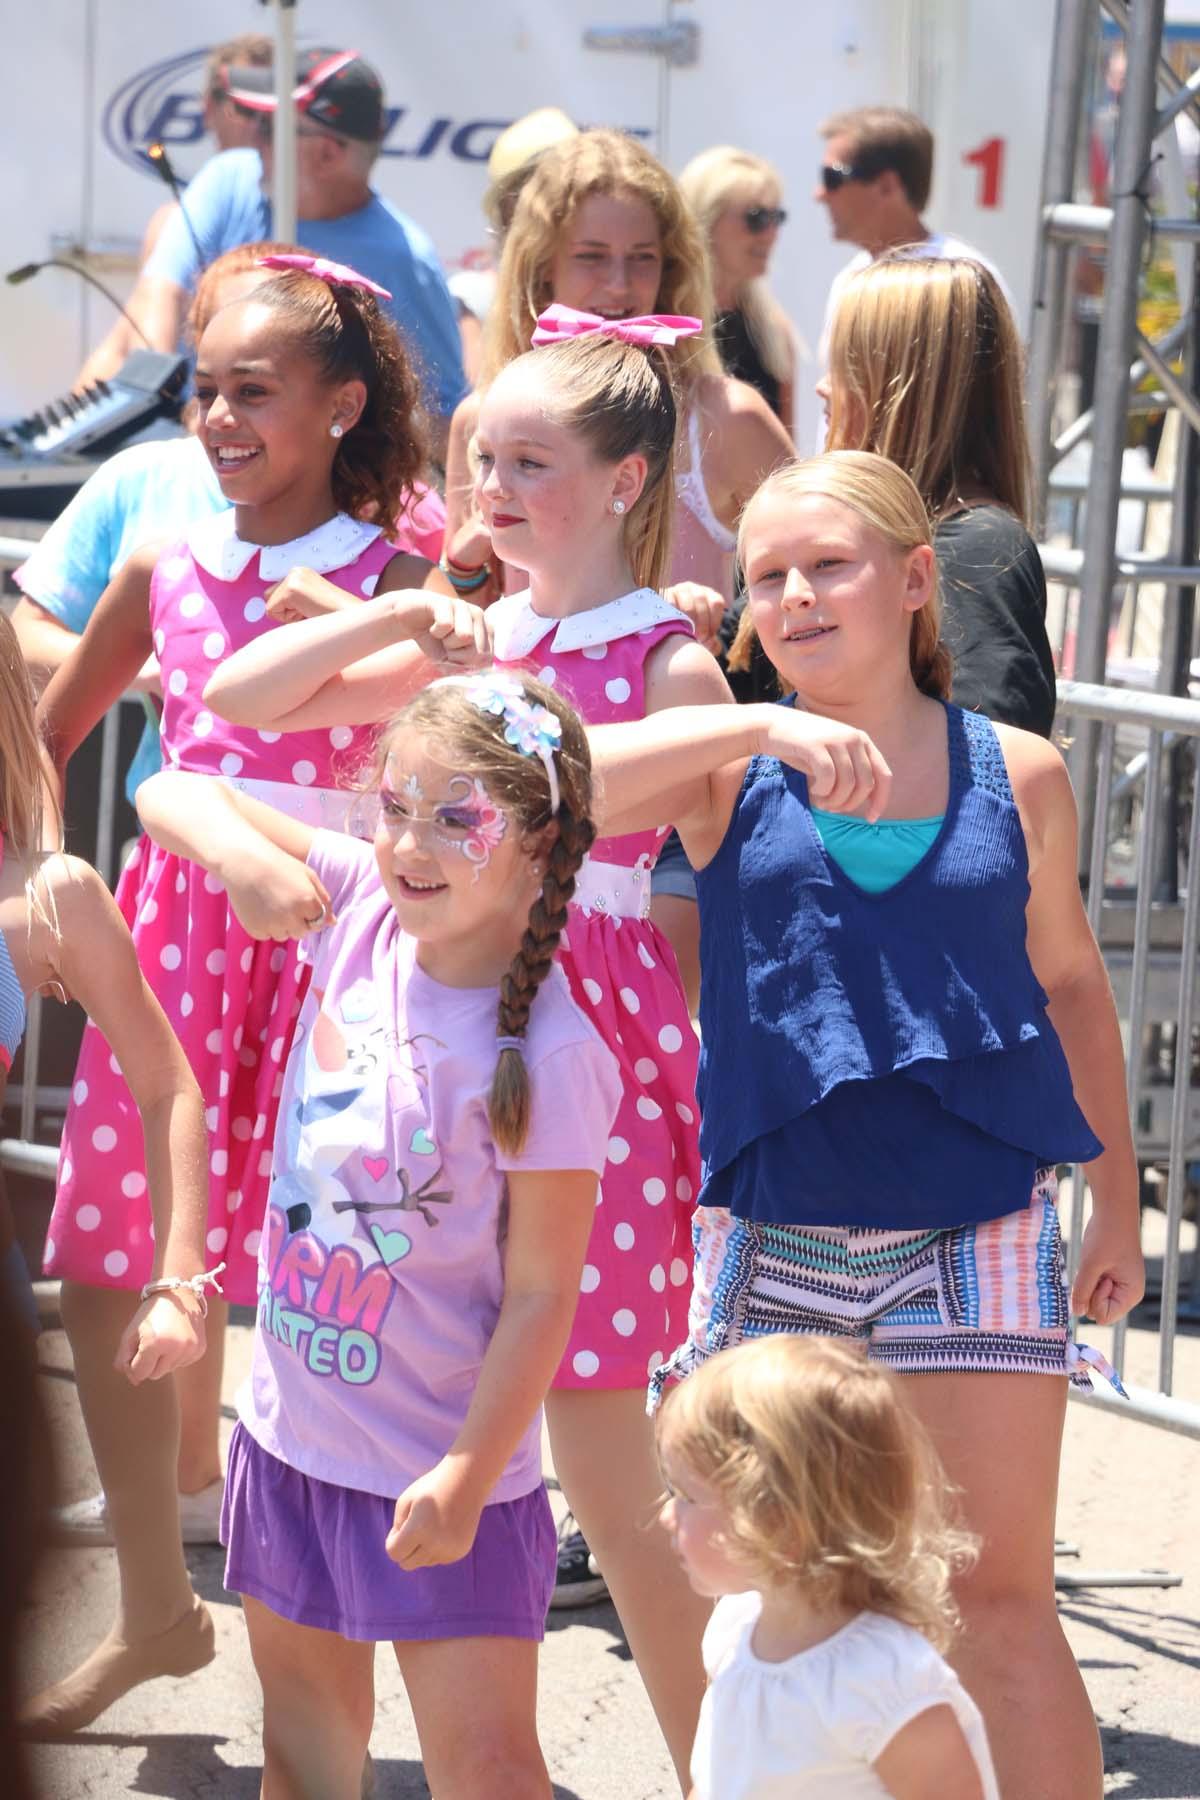 Dozens of children participated in the dance clincs at last year's Fiesta Music Festival. Photo: File